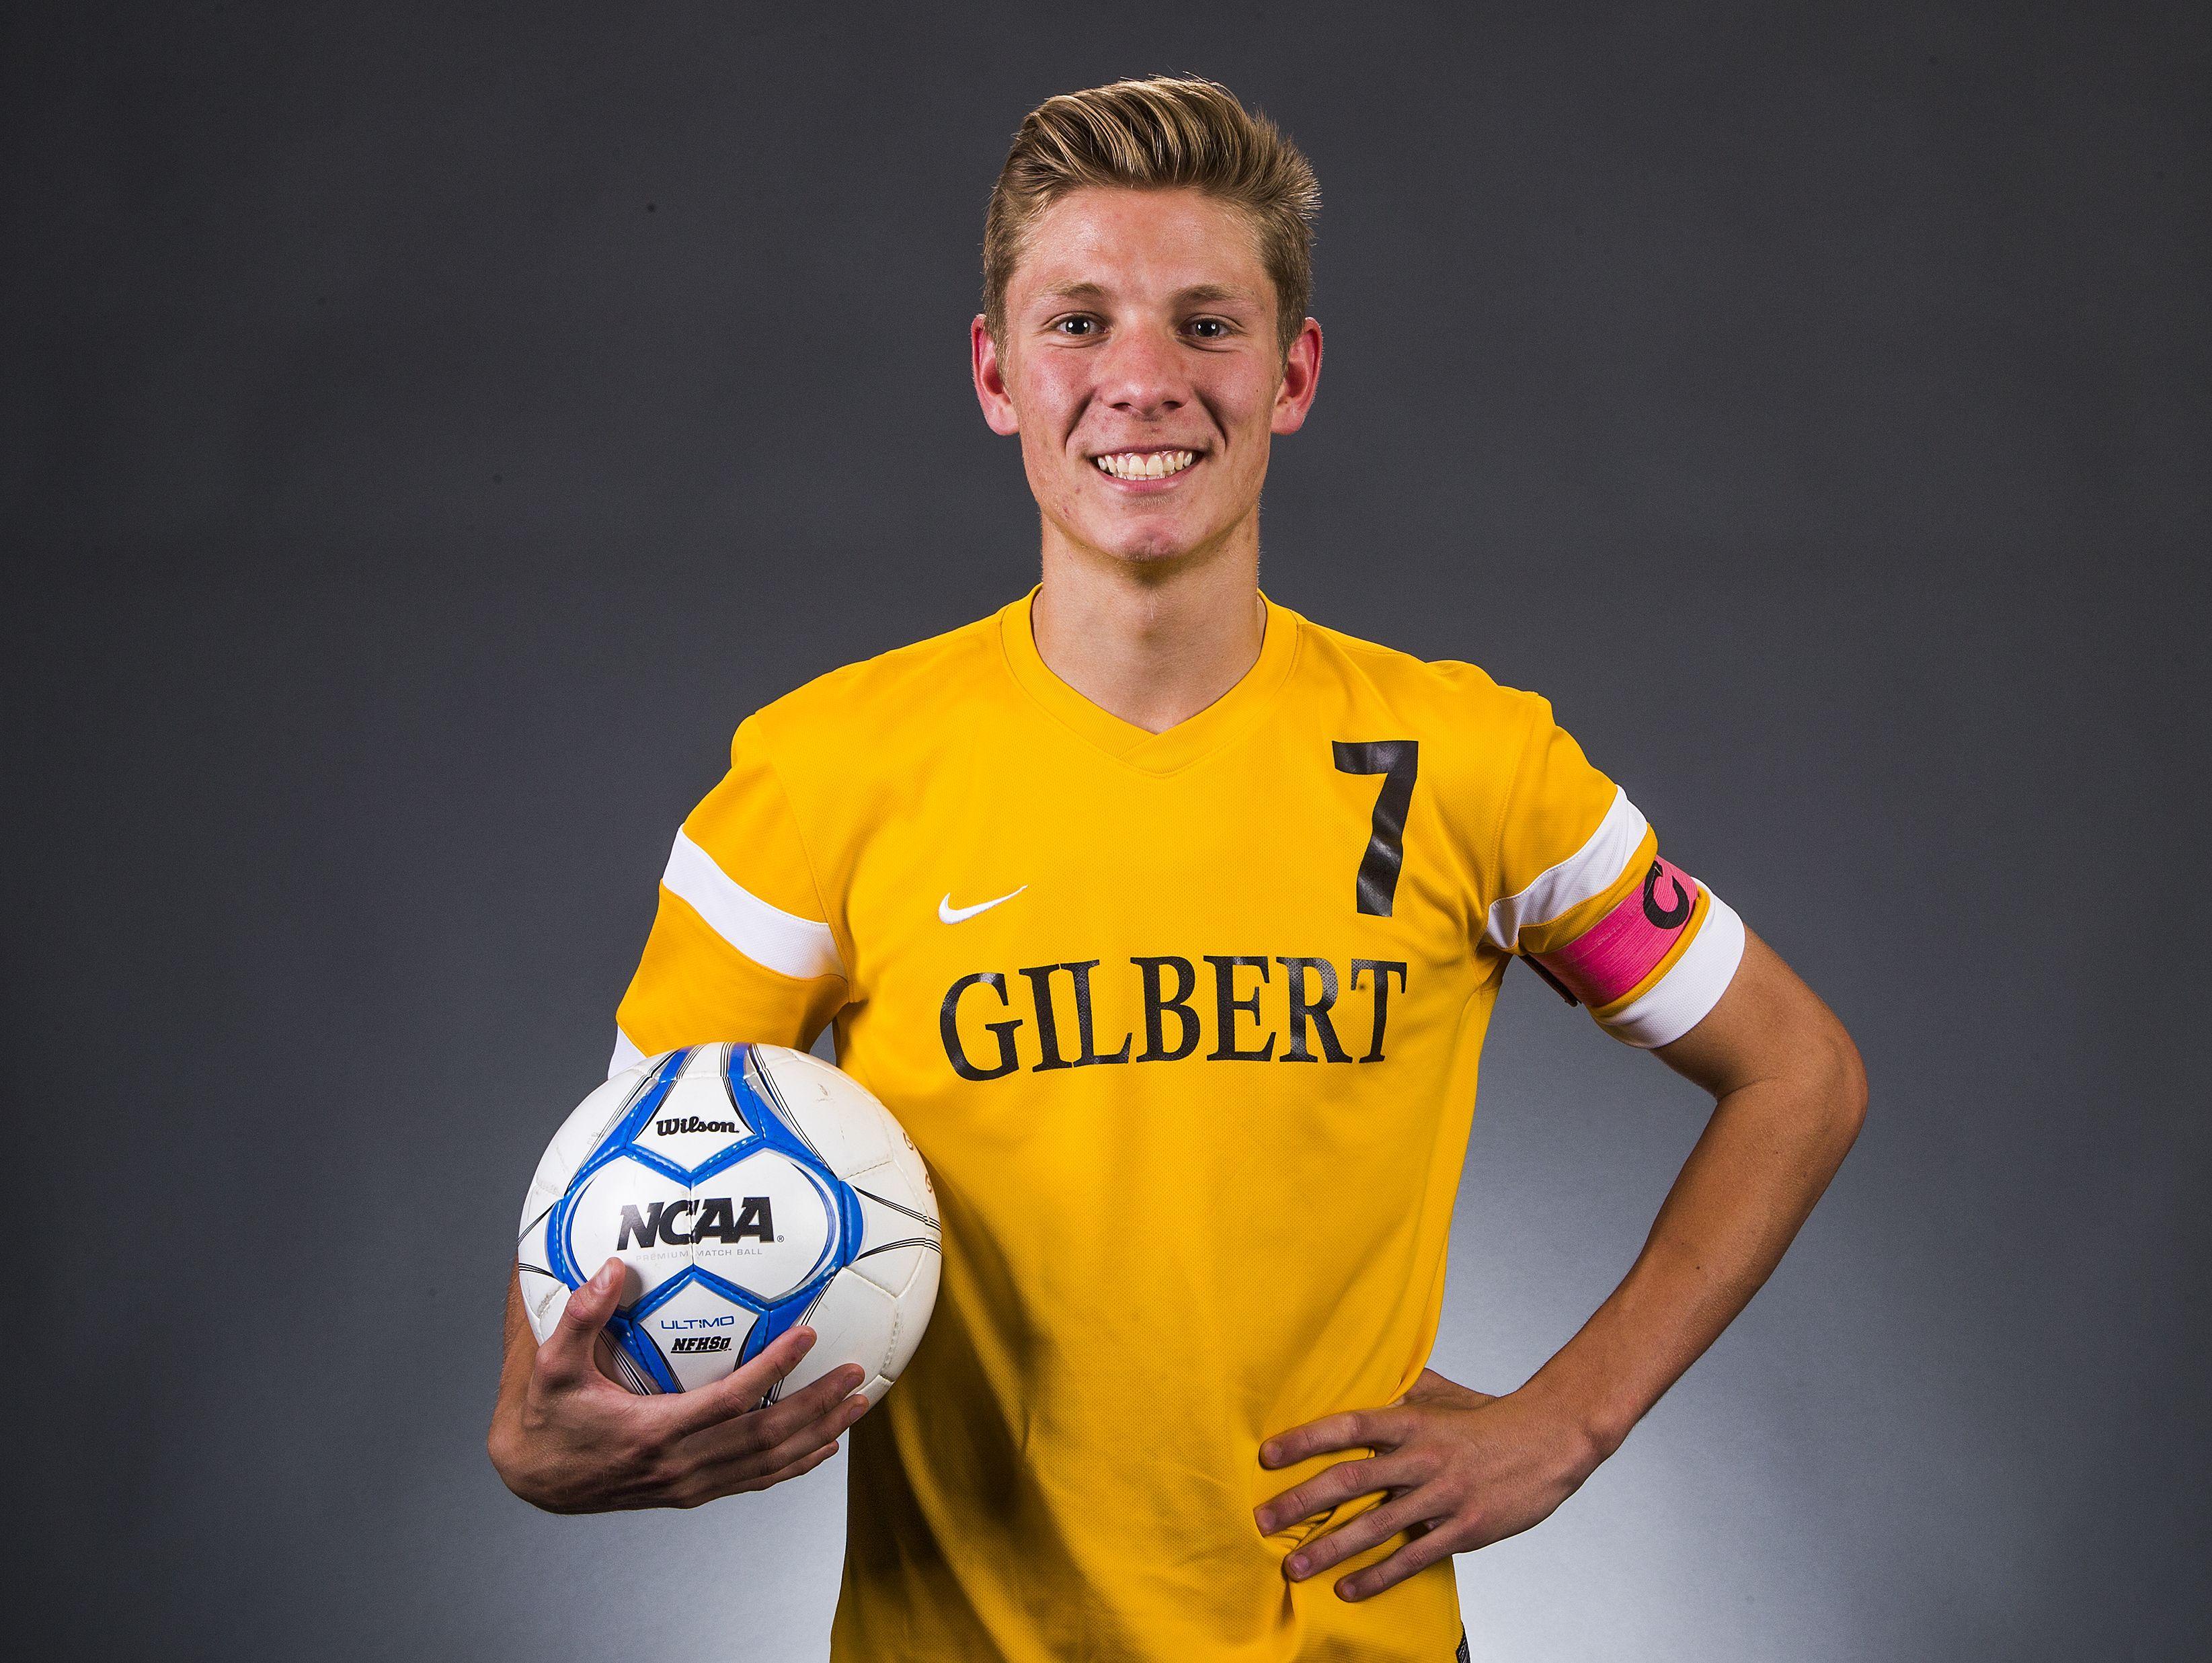 Gilbert senior forward Danny Baca is a finalist for the azcentral.com Sports Awards Big Schools Boys Soccer Athlete of the Year award.